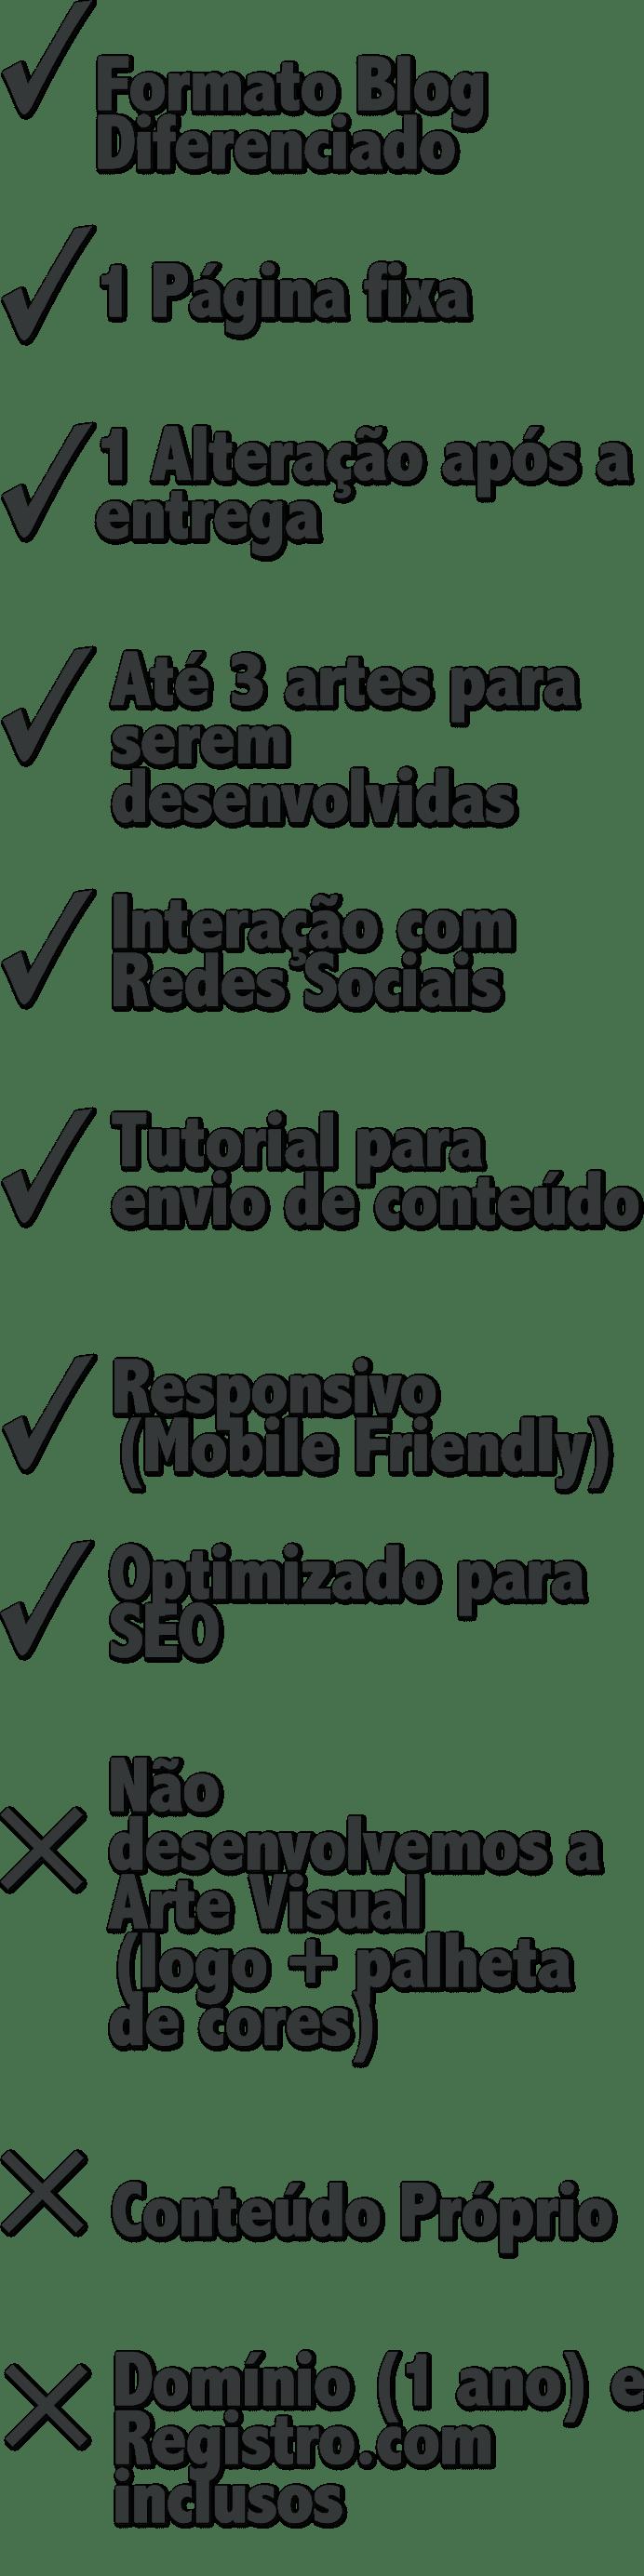 tipoblog